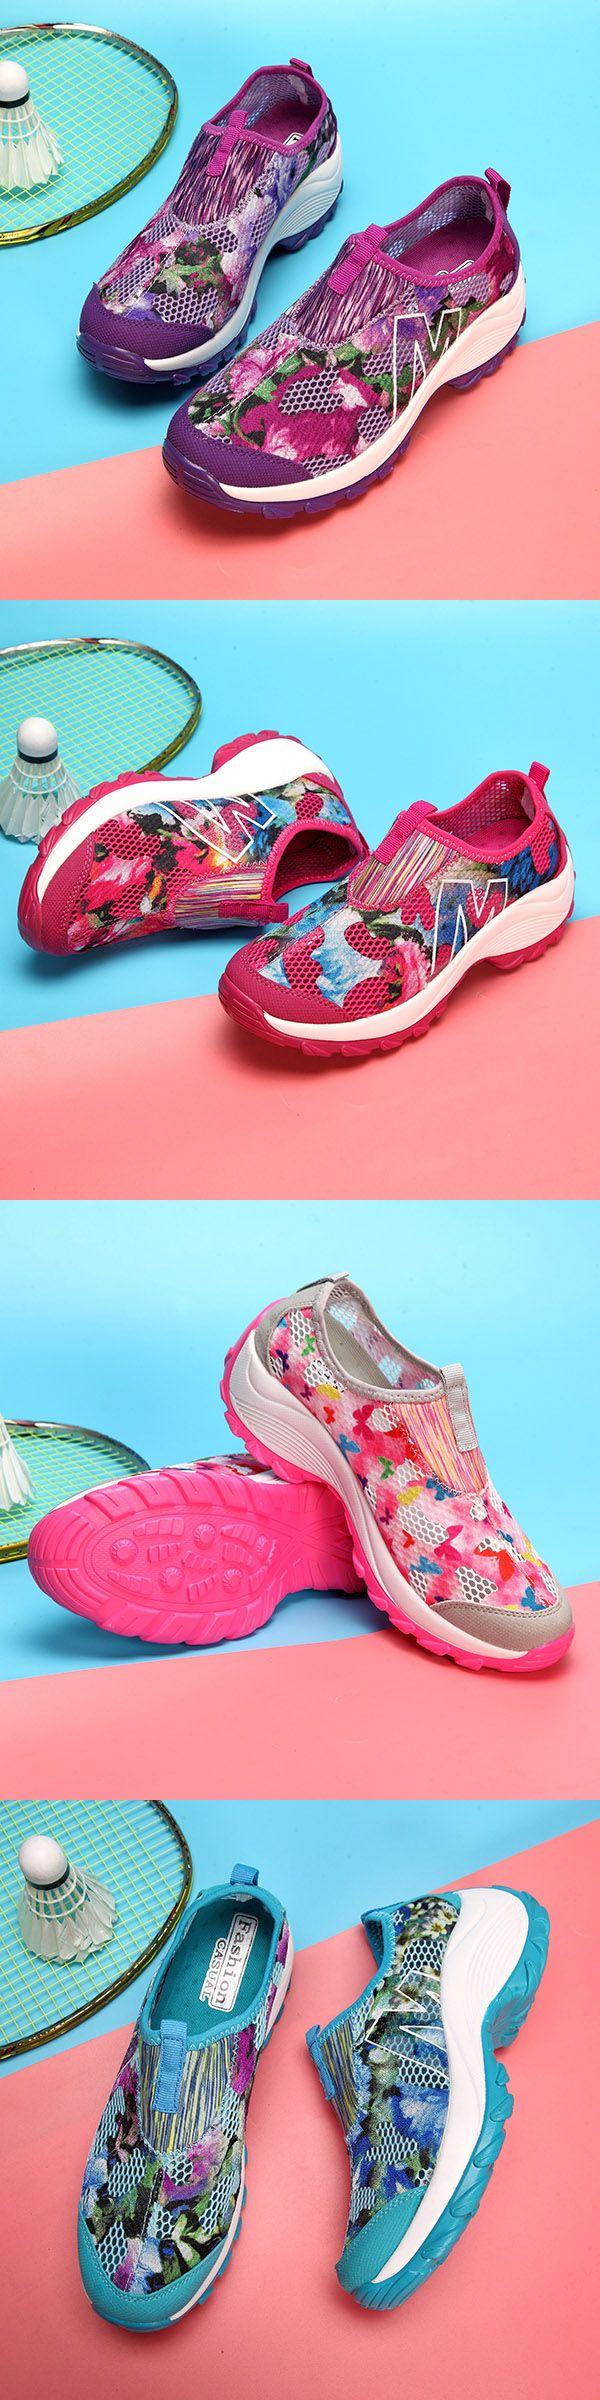 US$23.43  Flower Mesh Breathable Platform Rocker Sole Casual Shoes